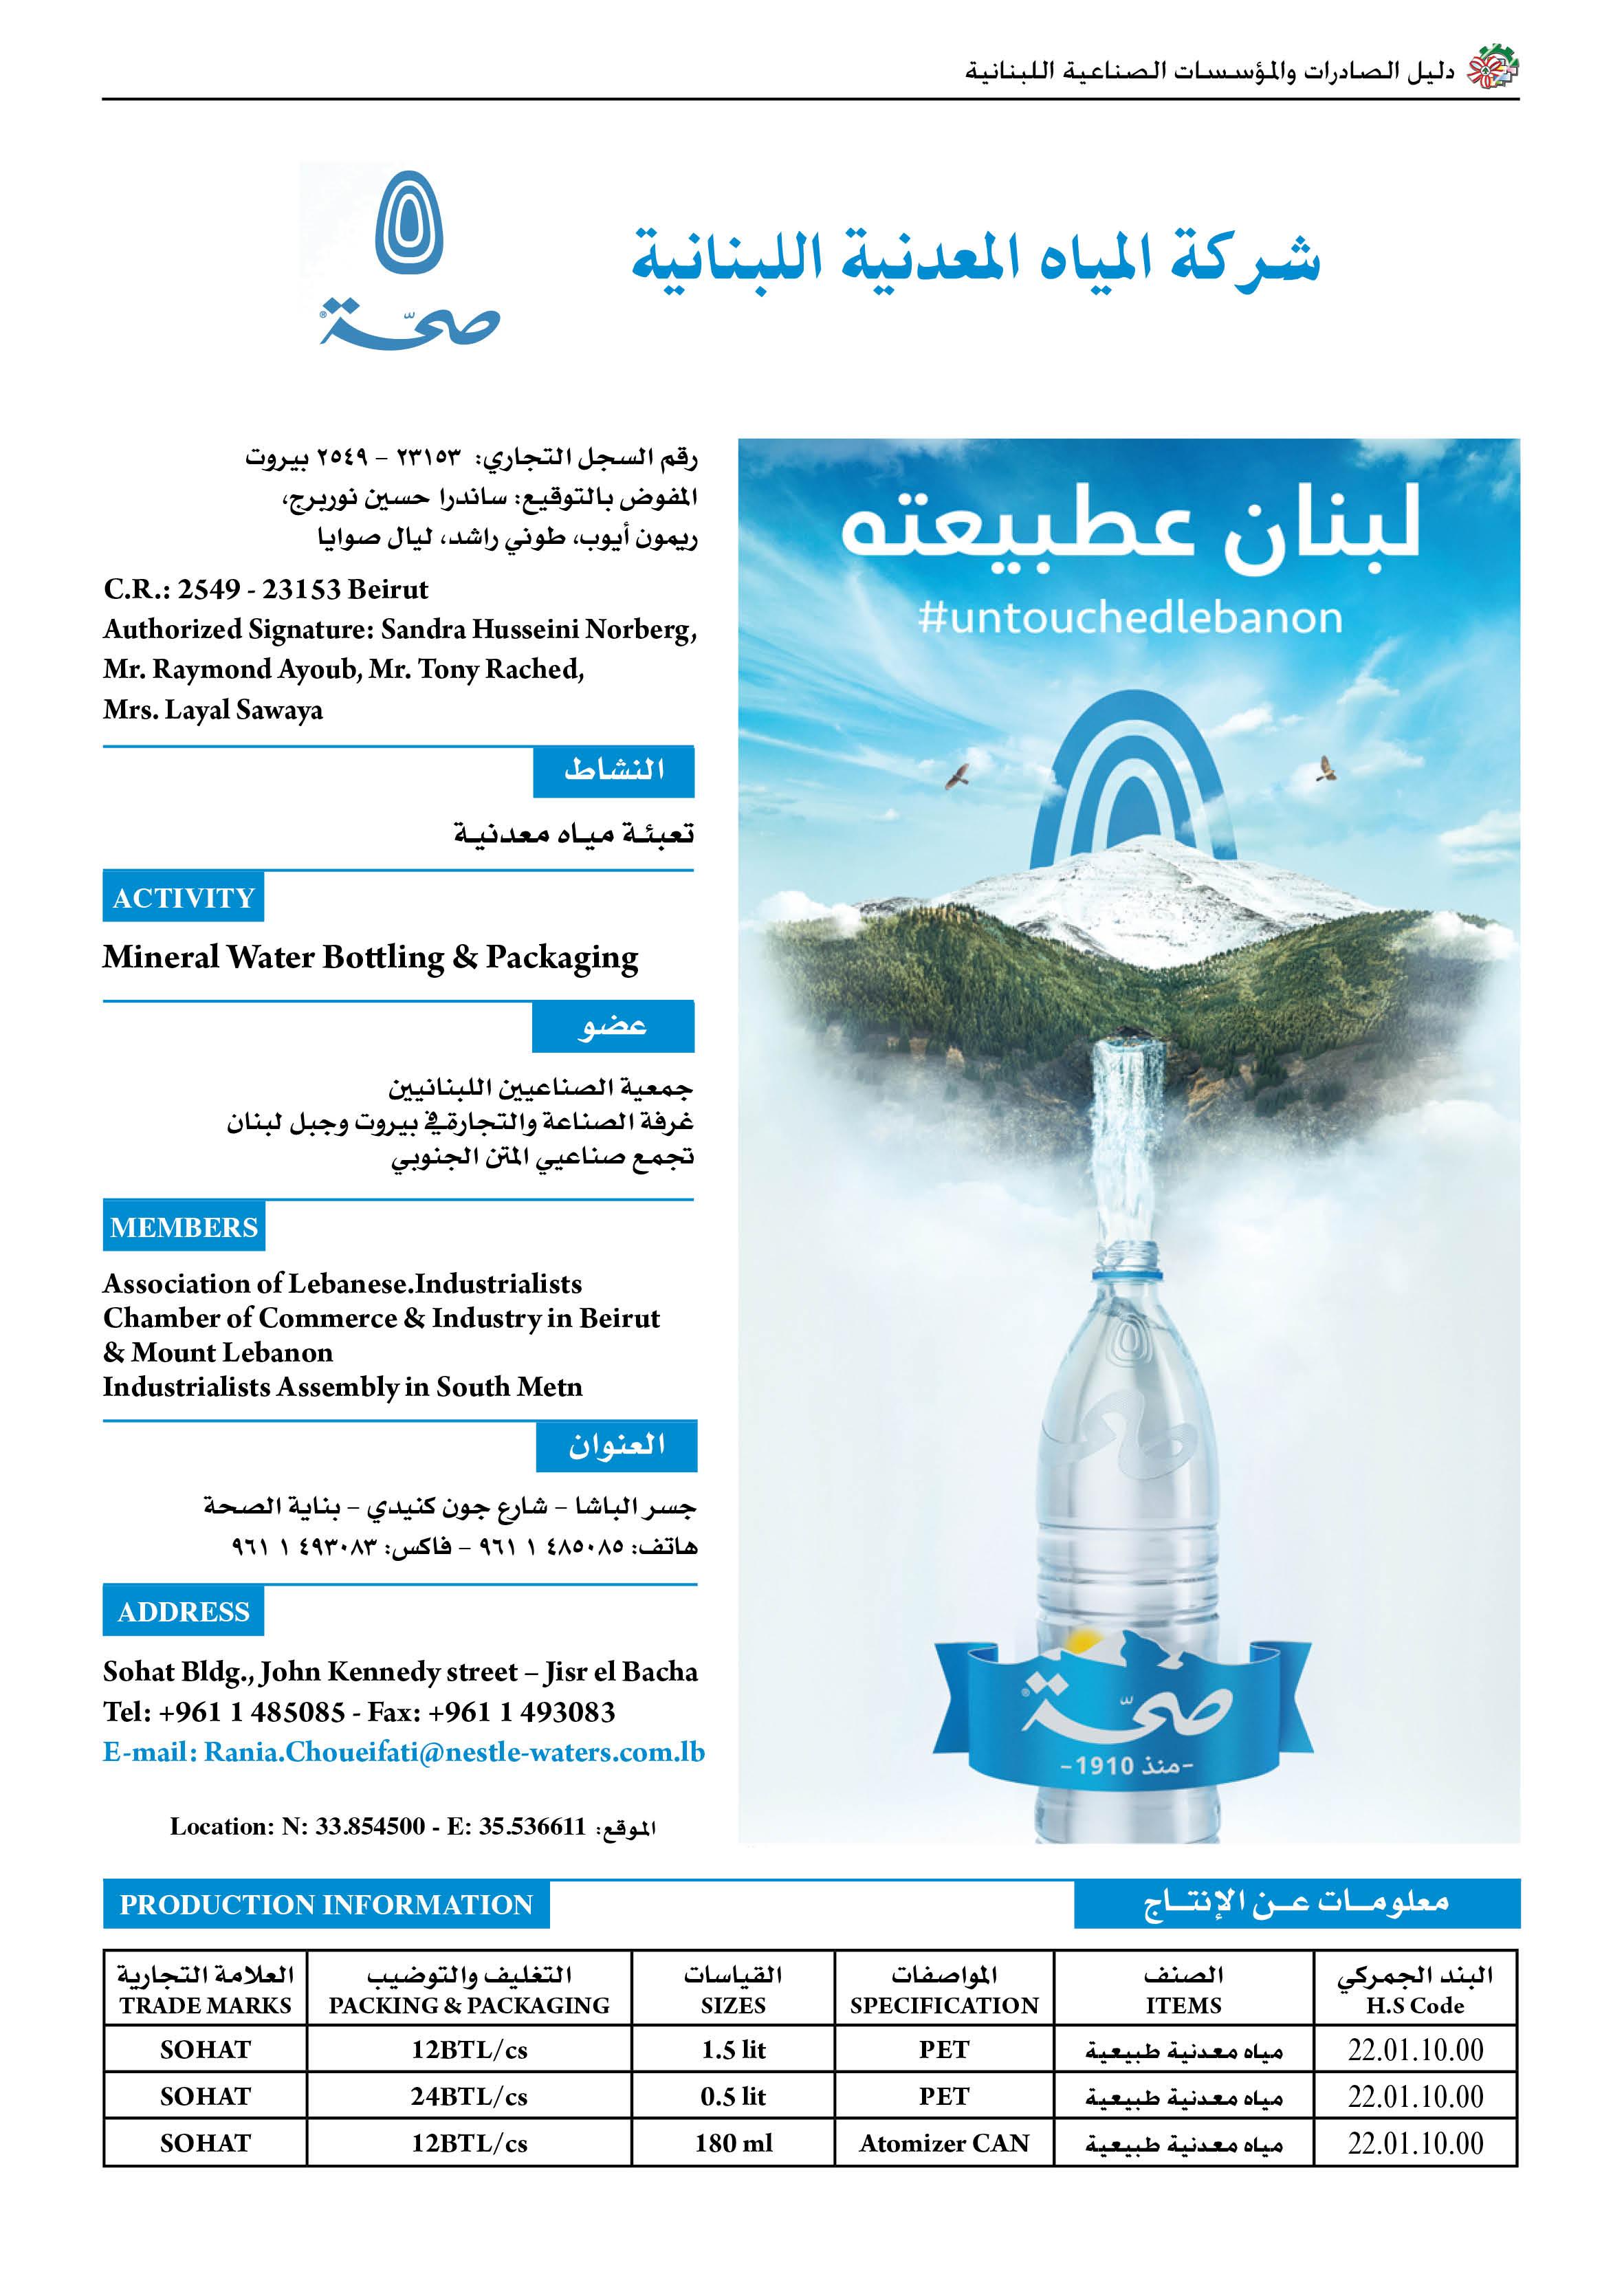 Lebanon Industry List Of Lebanon Industries List Of Insurance And Bank Companies In Lebanon Made In Lebanon Harmonized Code Commodity Lebanon دليل الصادرات والمؤسسات الصناعية اللبنانية